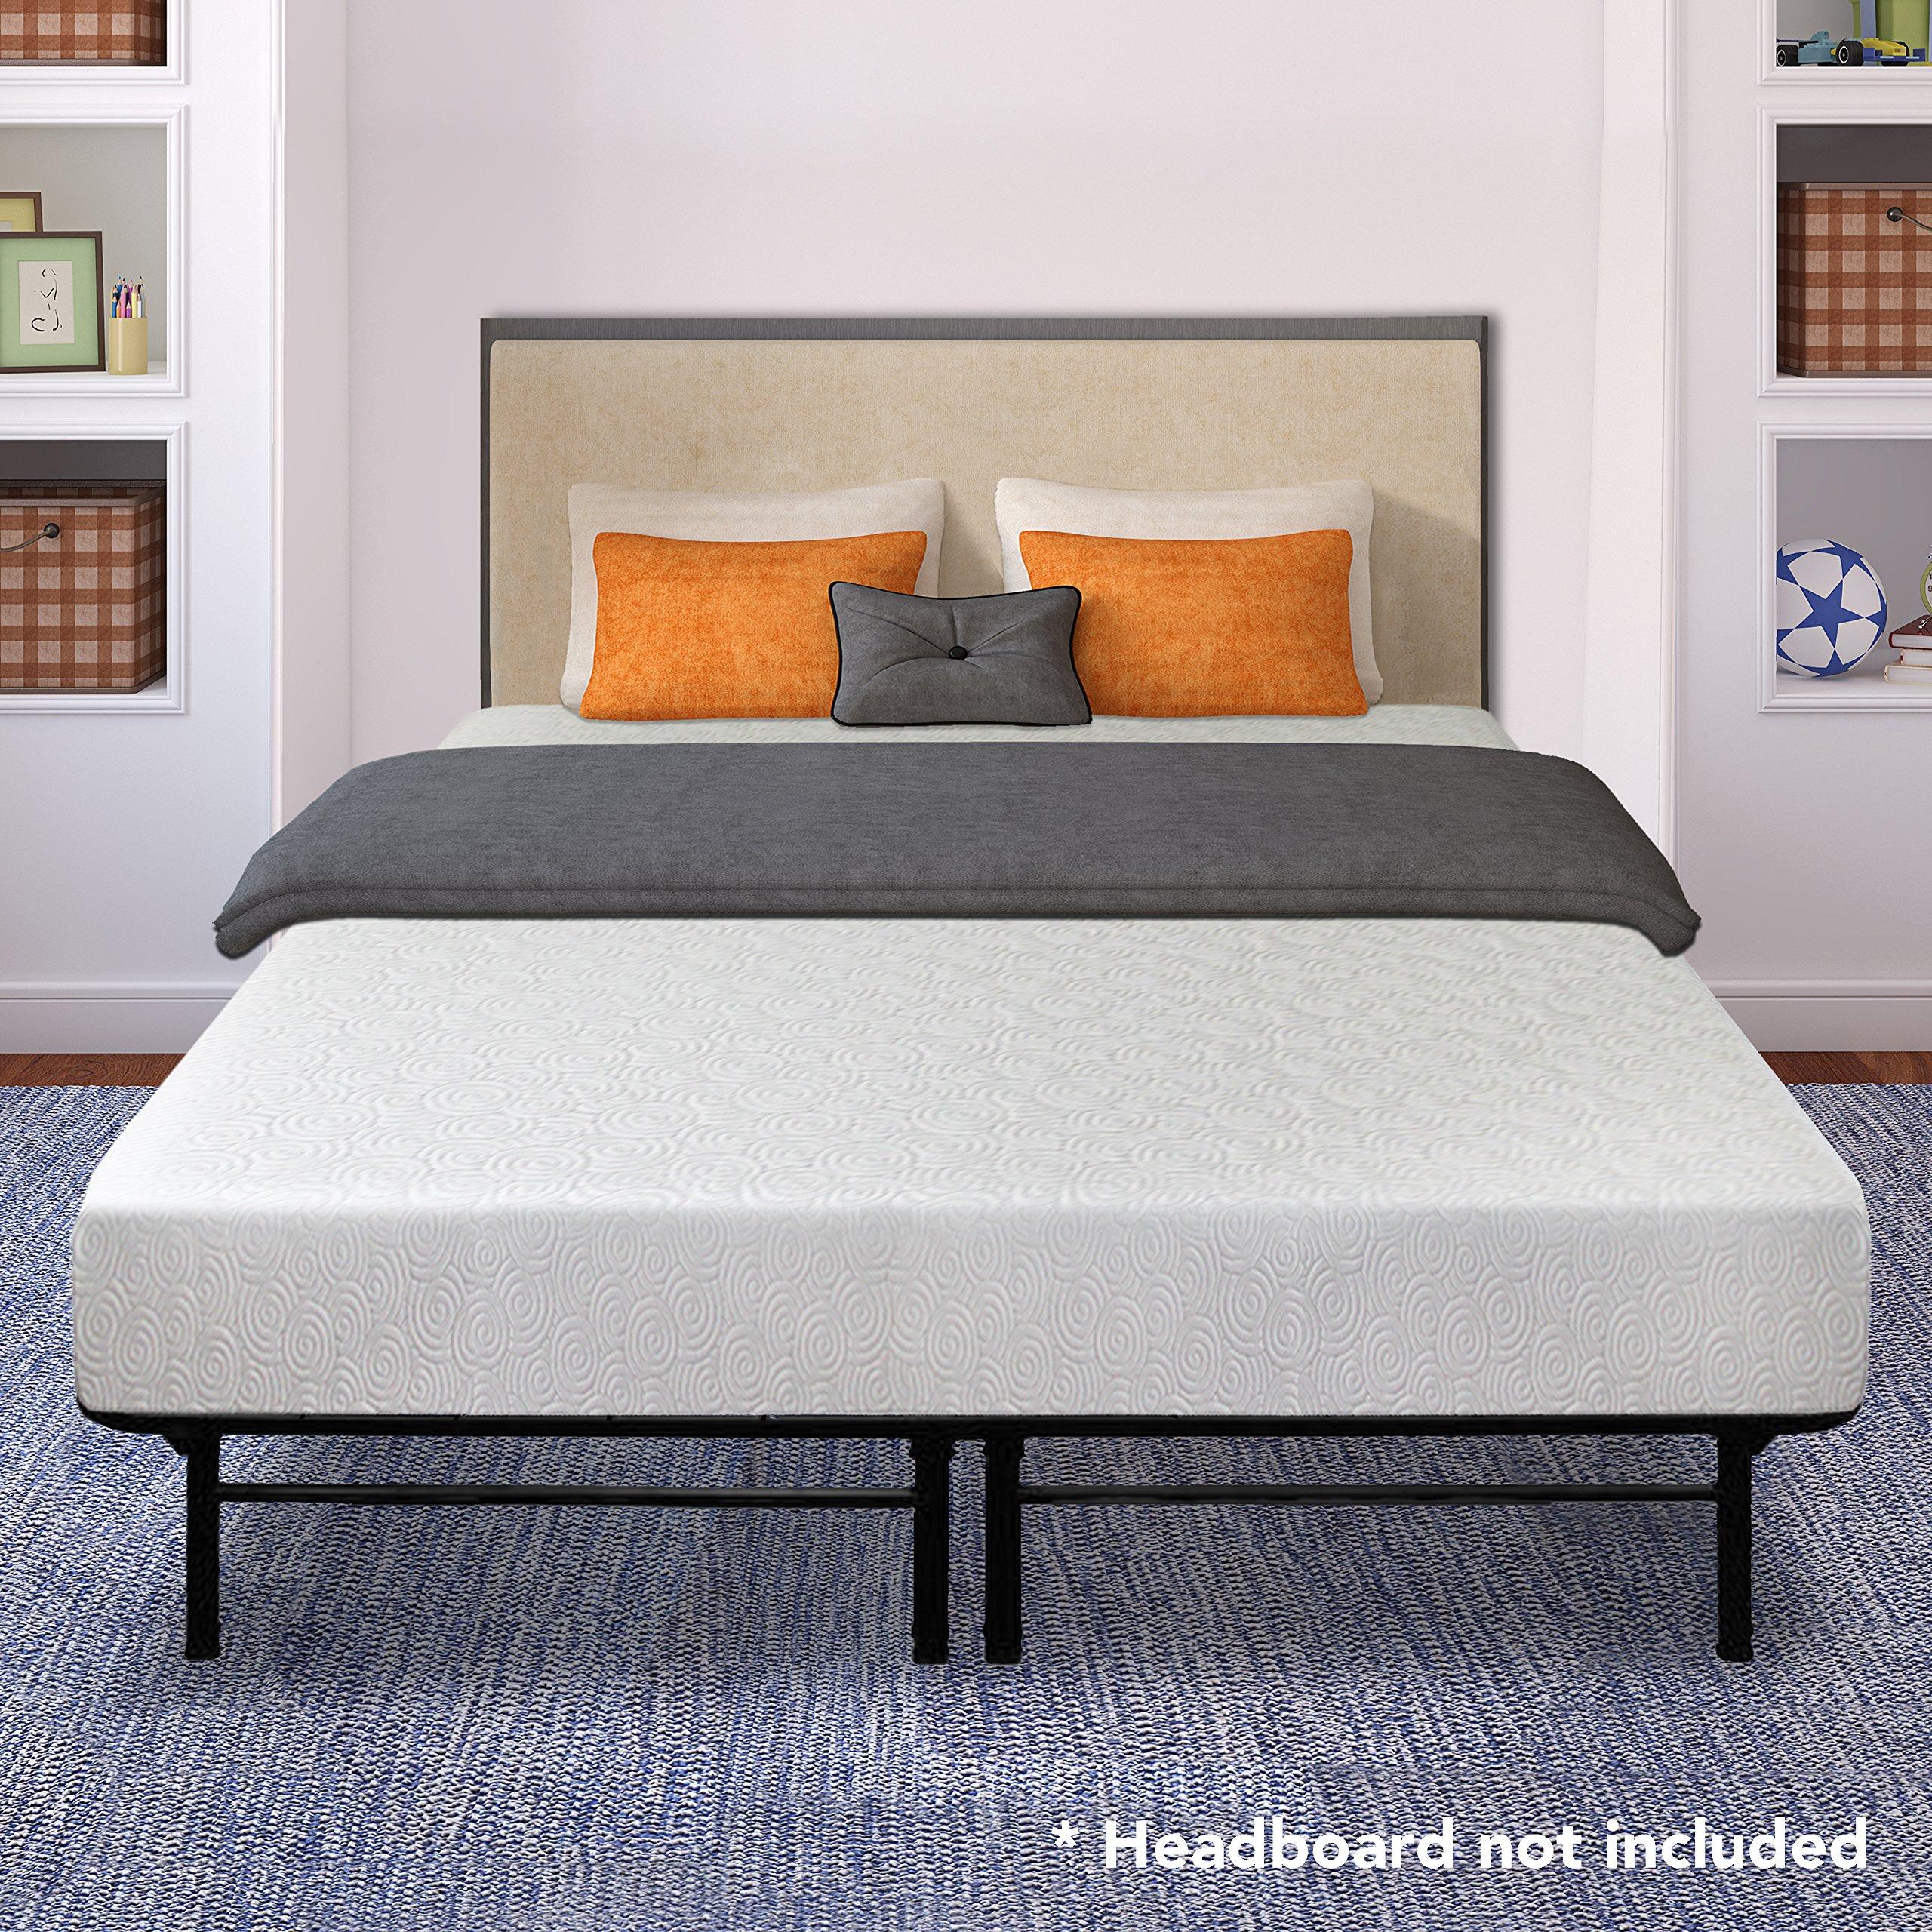 Best Price Mattress 7'' Gel Memory Foam Mattress and 14'' Dual-Use Steel Bed Frame/Foundation Set, Full